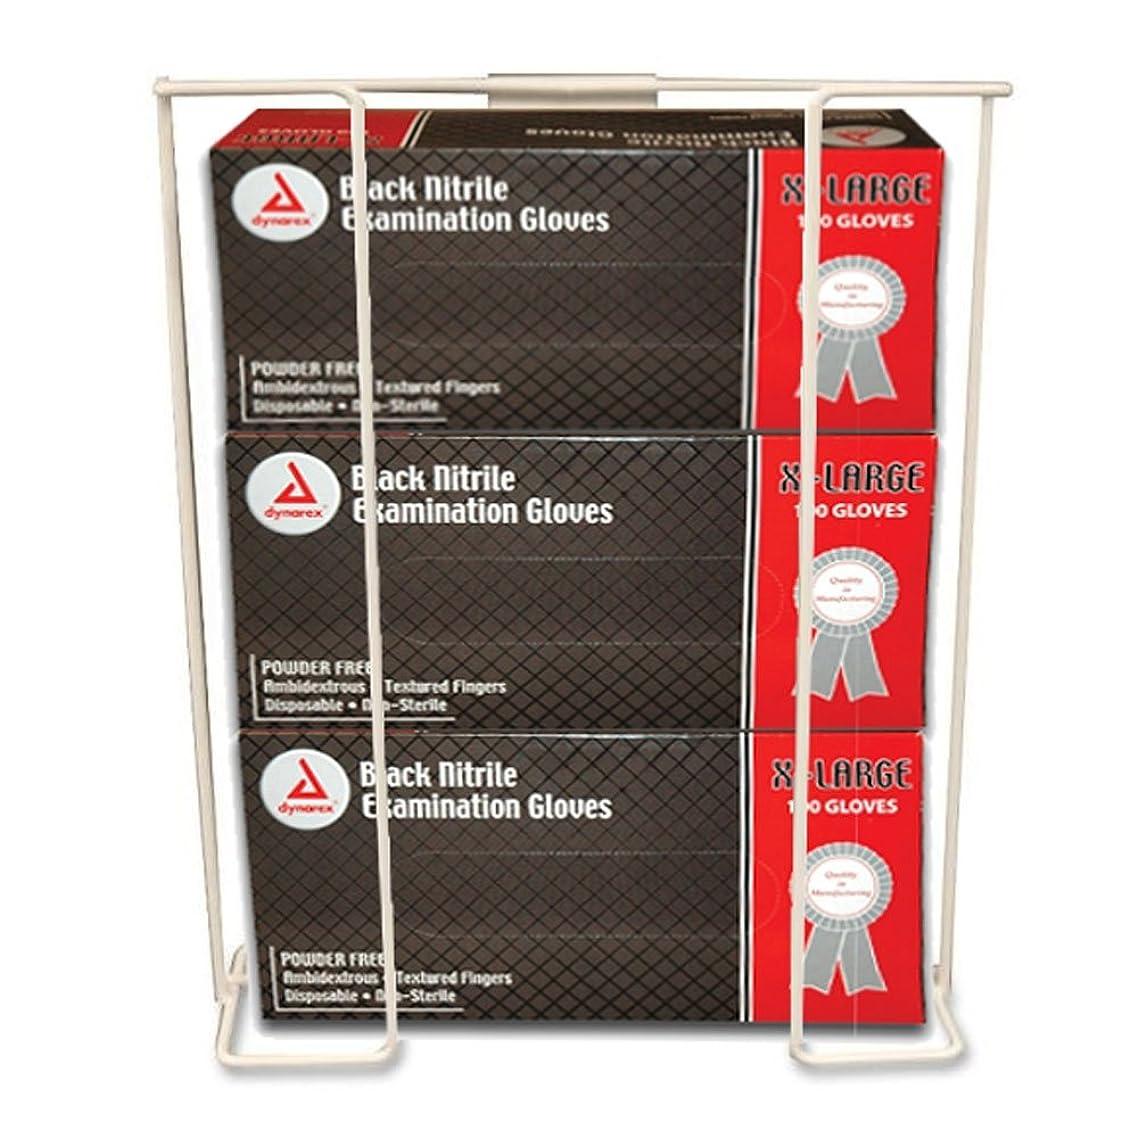 Universal Glove Box Holder - Dispenser, Triple Size, Each